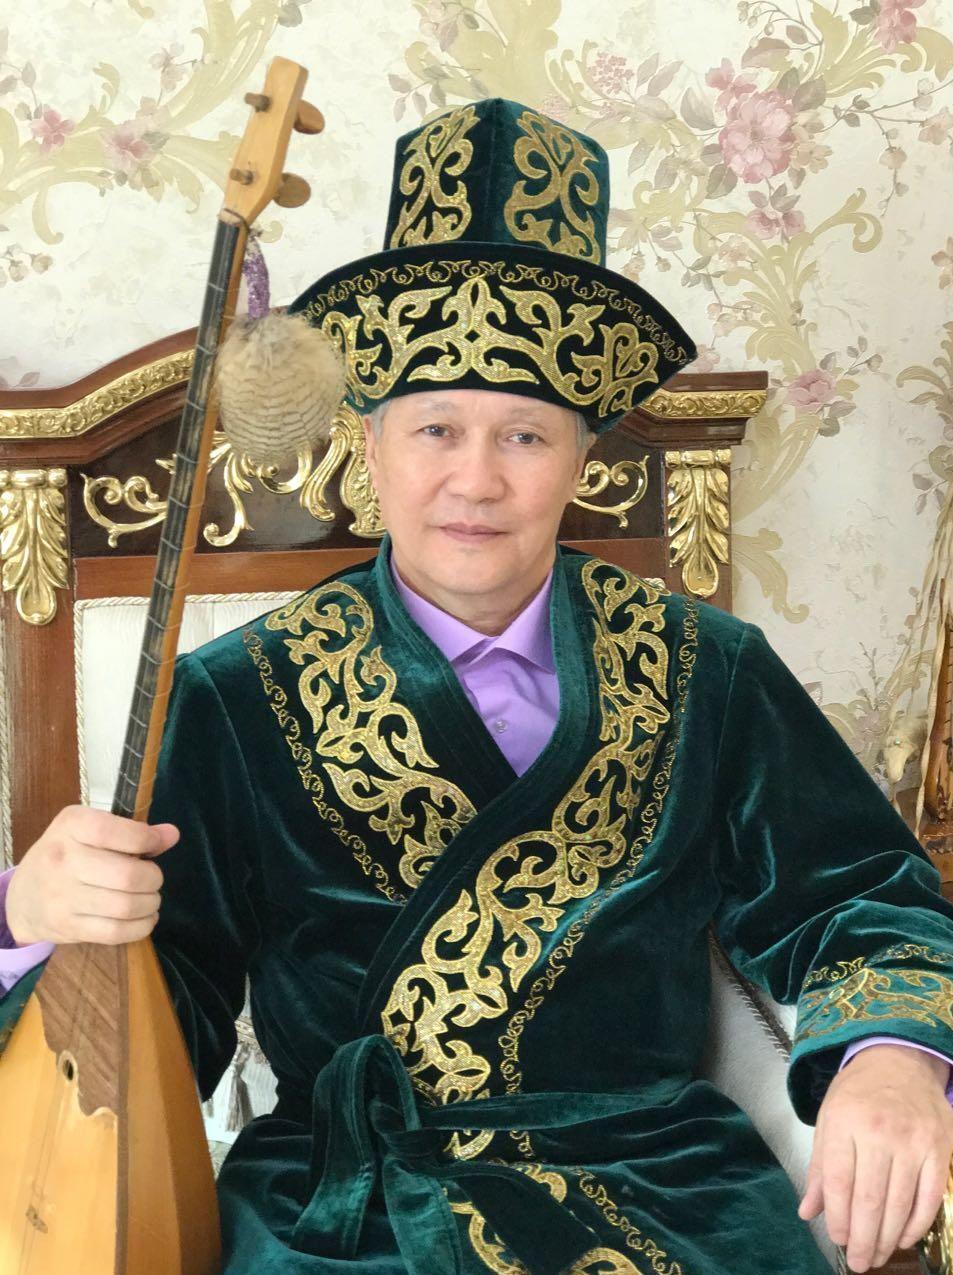 Советский казахский поэт, писатель, драматург, акын — импровизатор, сатирик, критик, литературовед Баянгали Алимжанов